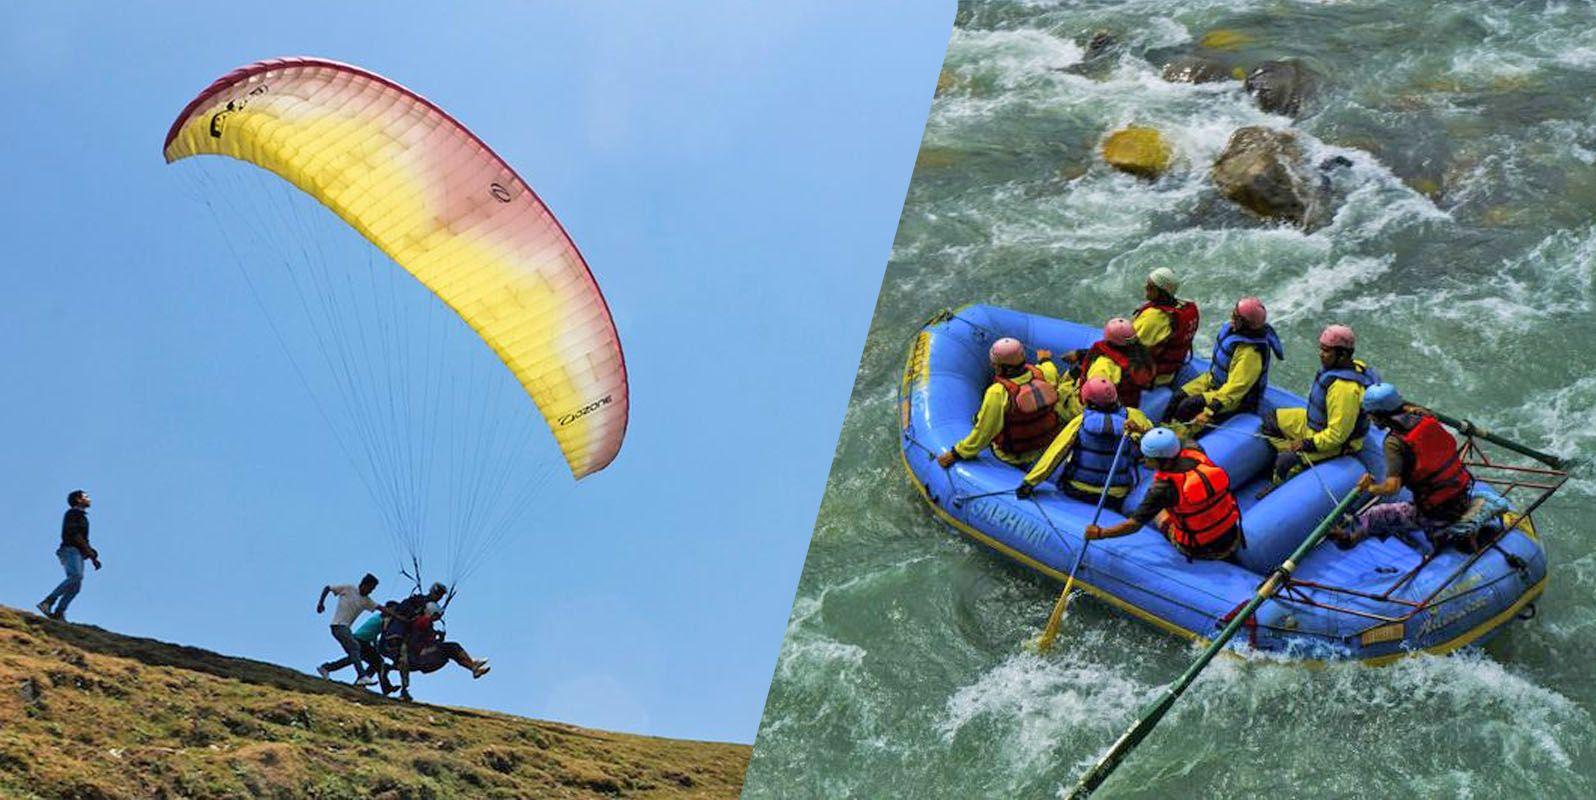 HP Govt notified new adventure sports sites in himachal pradesh